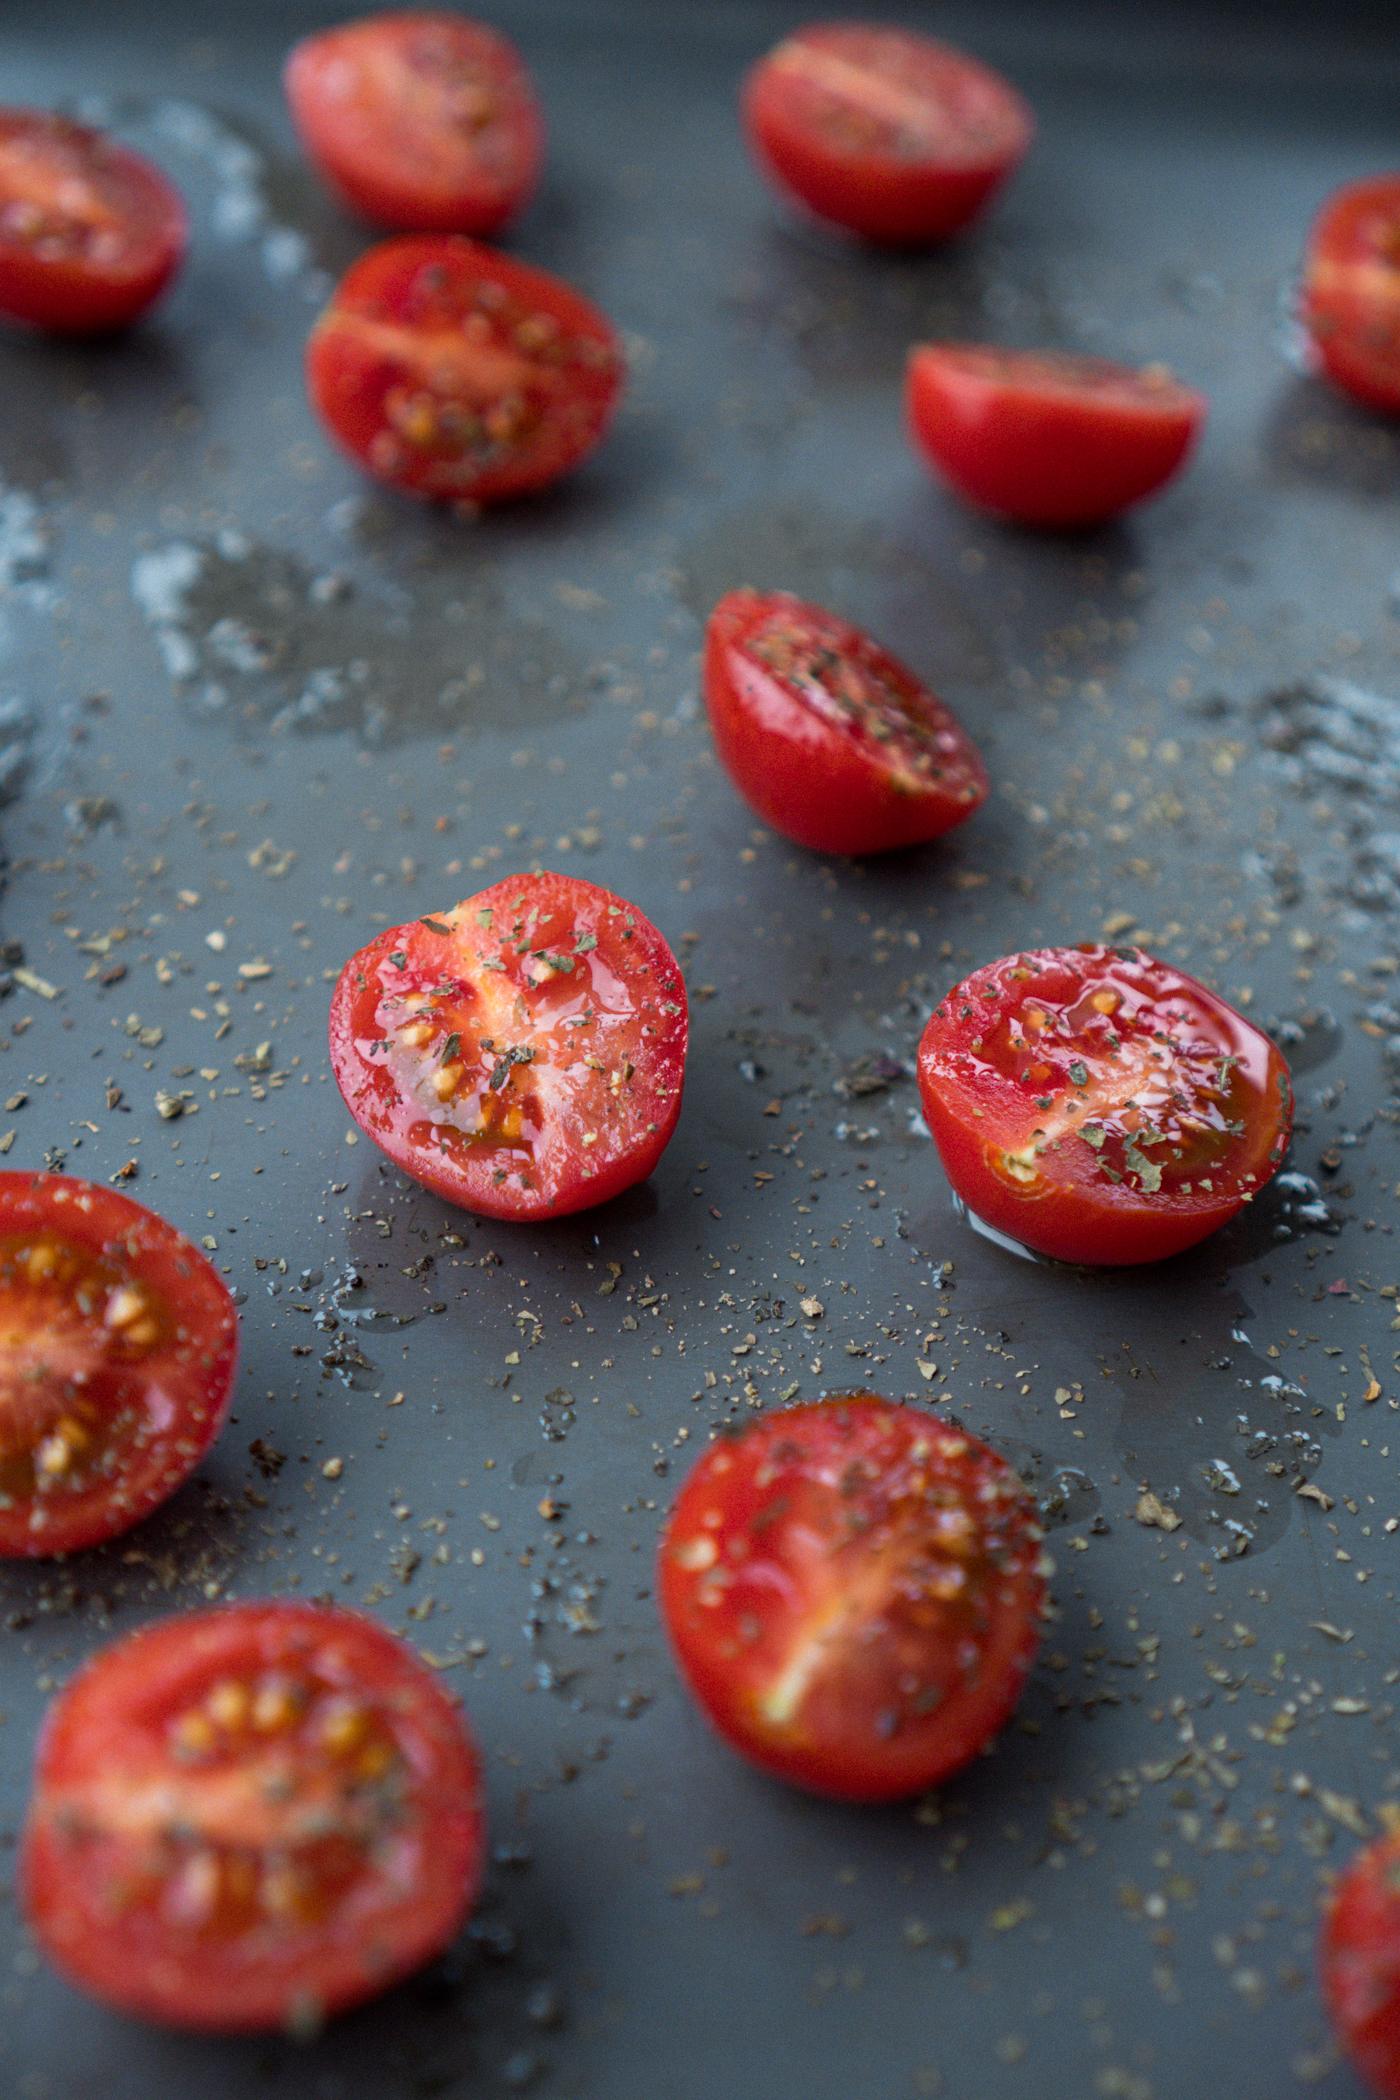 roasted_cherry_tomato_bruschettas_with_balsamic_glaze.jpg